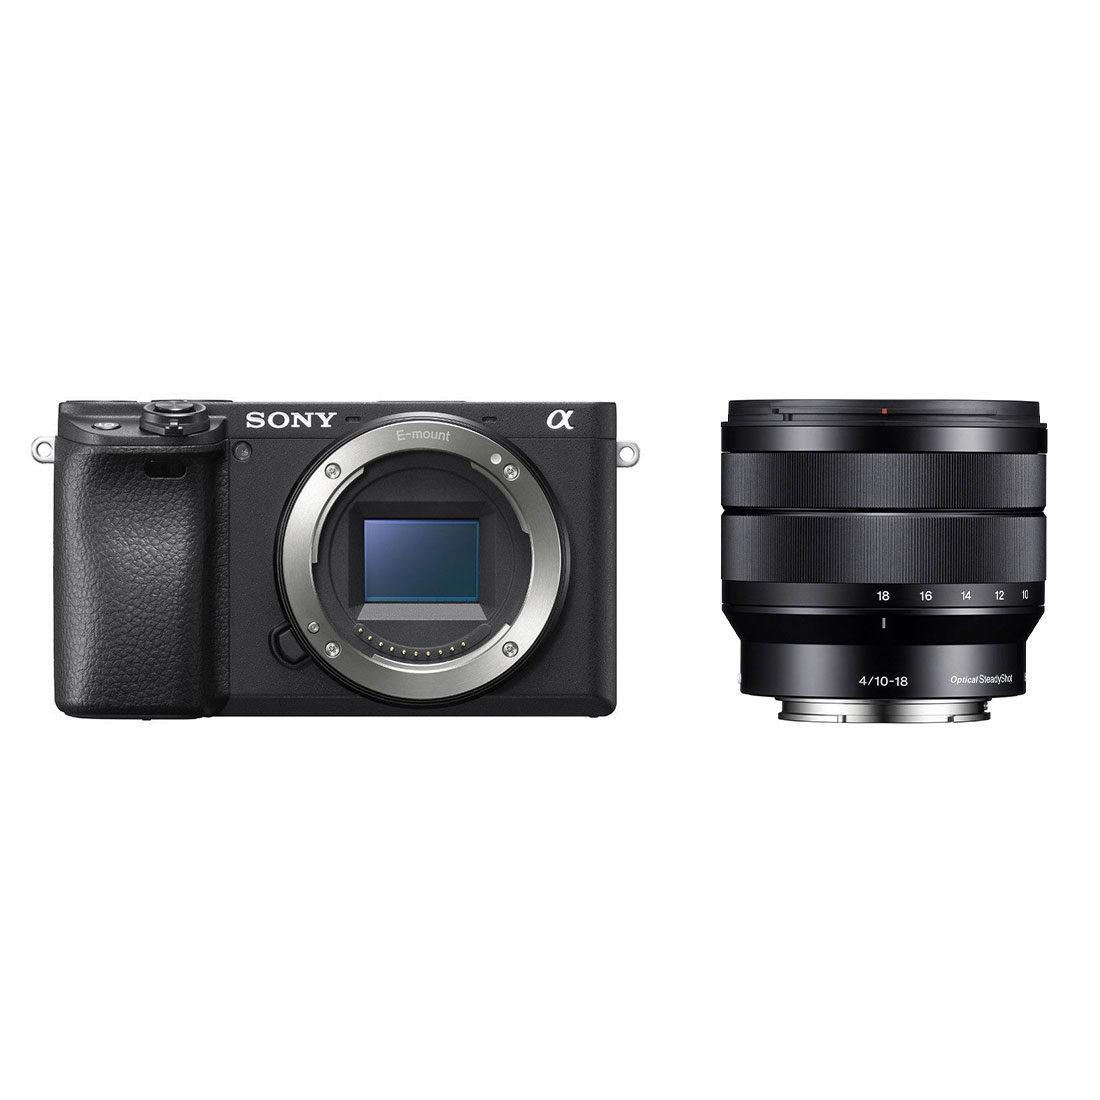 Sony Alpha A6400 systeemcamera Zwart + 10-18mm f/4.0 <br/>€ 1549.00 <br/> <a href='https://www.cameranu.nl/fotografie/?tt=12190_474631_241358_&r=https%3A%2F%2Fwww.cameranu.nl%2Fnl%2Fp3194867%2Fsony-alpha-a6400-systeemcamera-zwart-10-18mm-f-4-0%3Fchannable%3D002a5969640033313934383637bc%26utm_campaign%3D%26utm_content%3DSony%2Bsysteemcamera%26utm_source%3DTradetracker%26utm_medium%3Dcpc%26utm_term%3DDigitale%2Bcamera%26apos%3Bs' target='_blank'>naar de winkel</a>